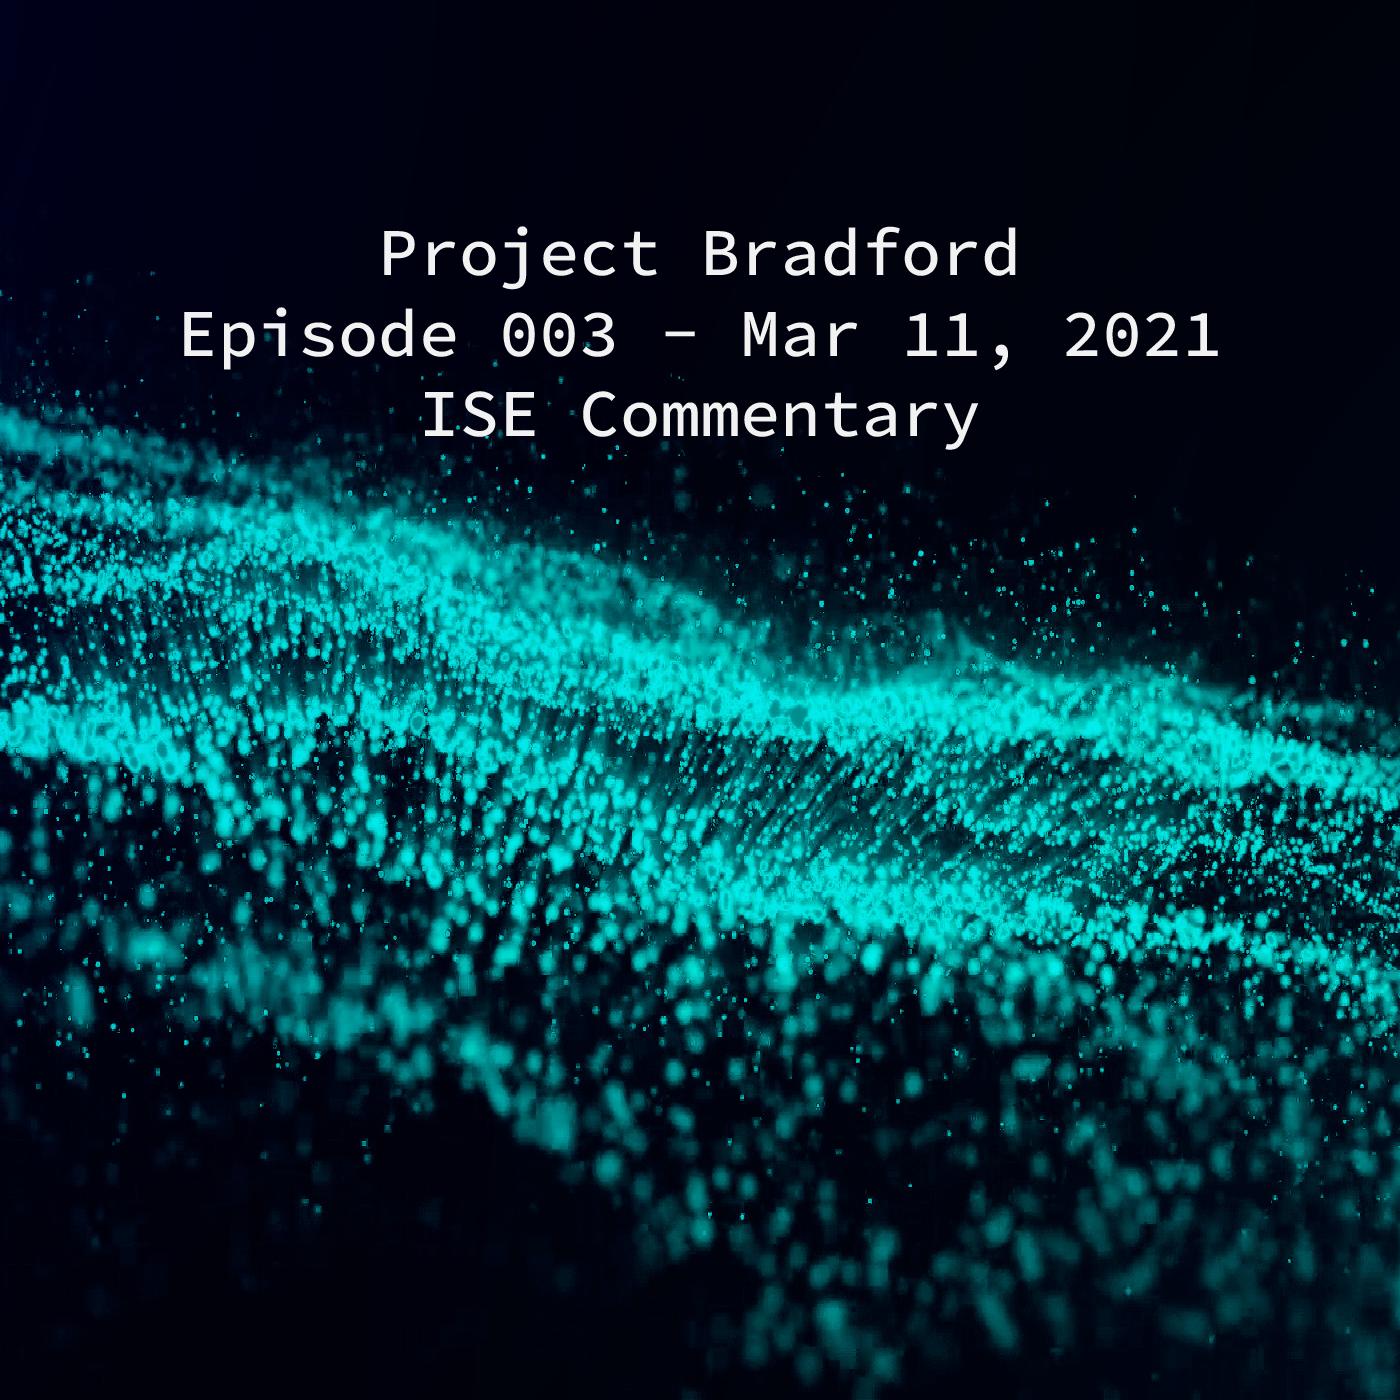 Project Bradford